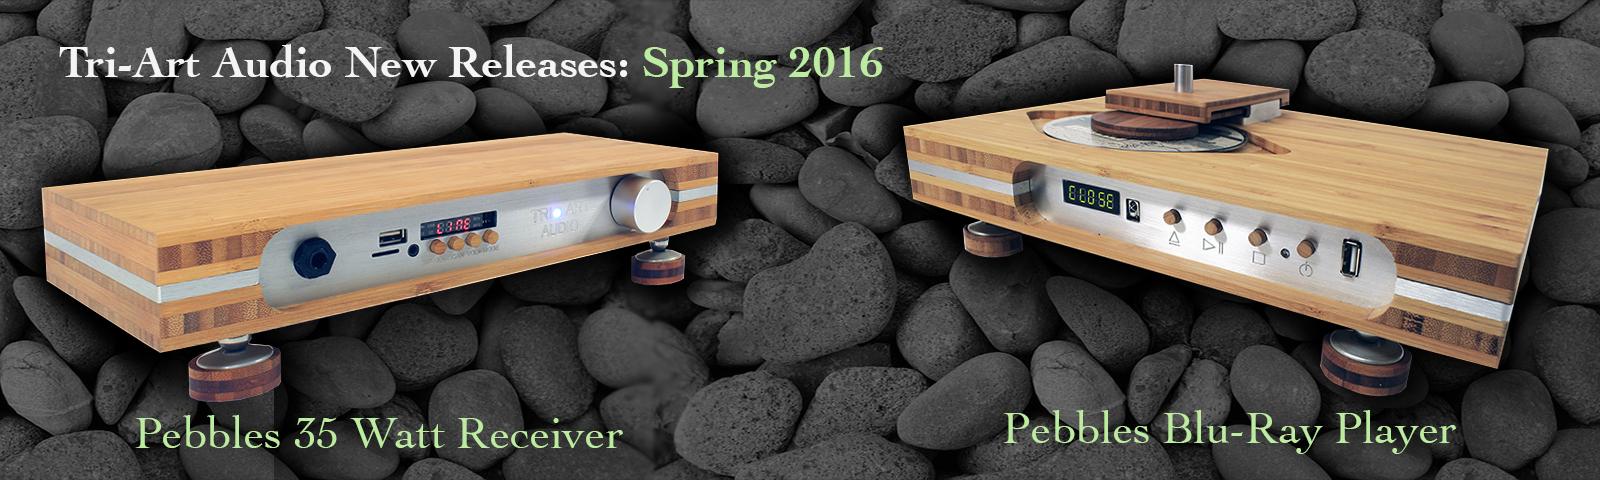 Spring 2016 Release Slider 35W